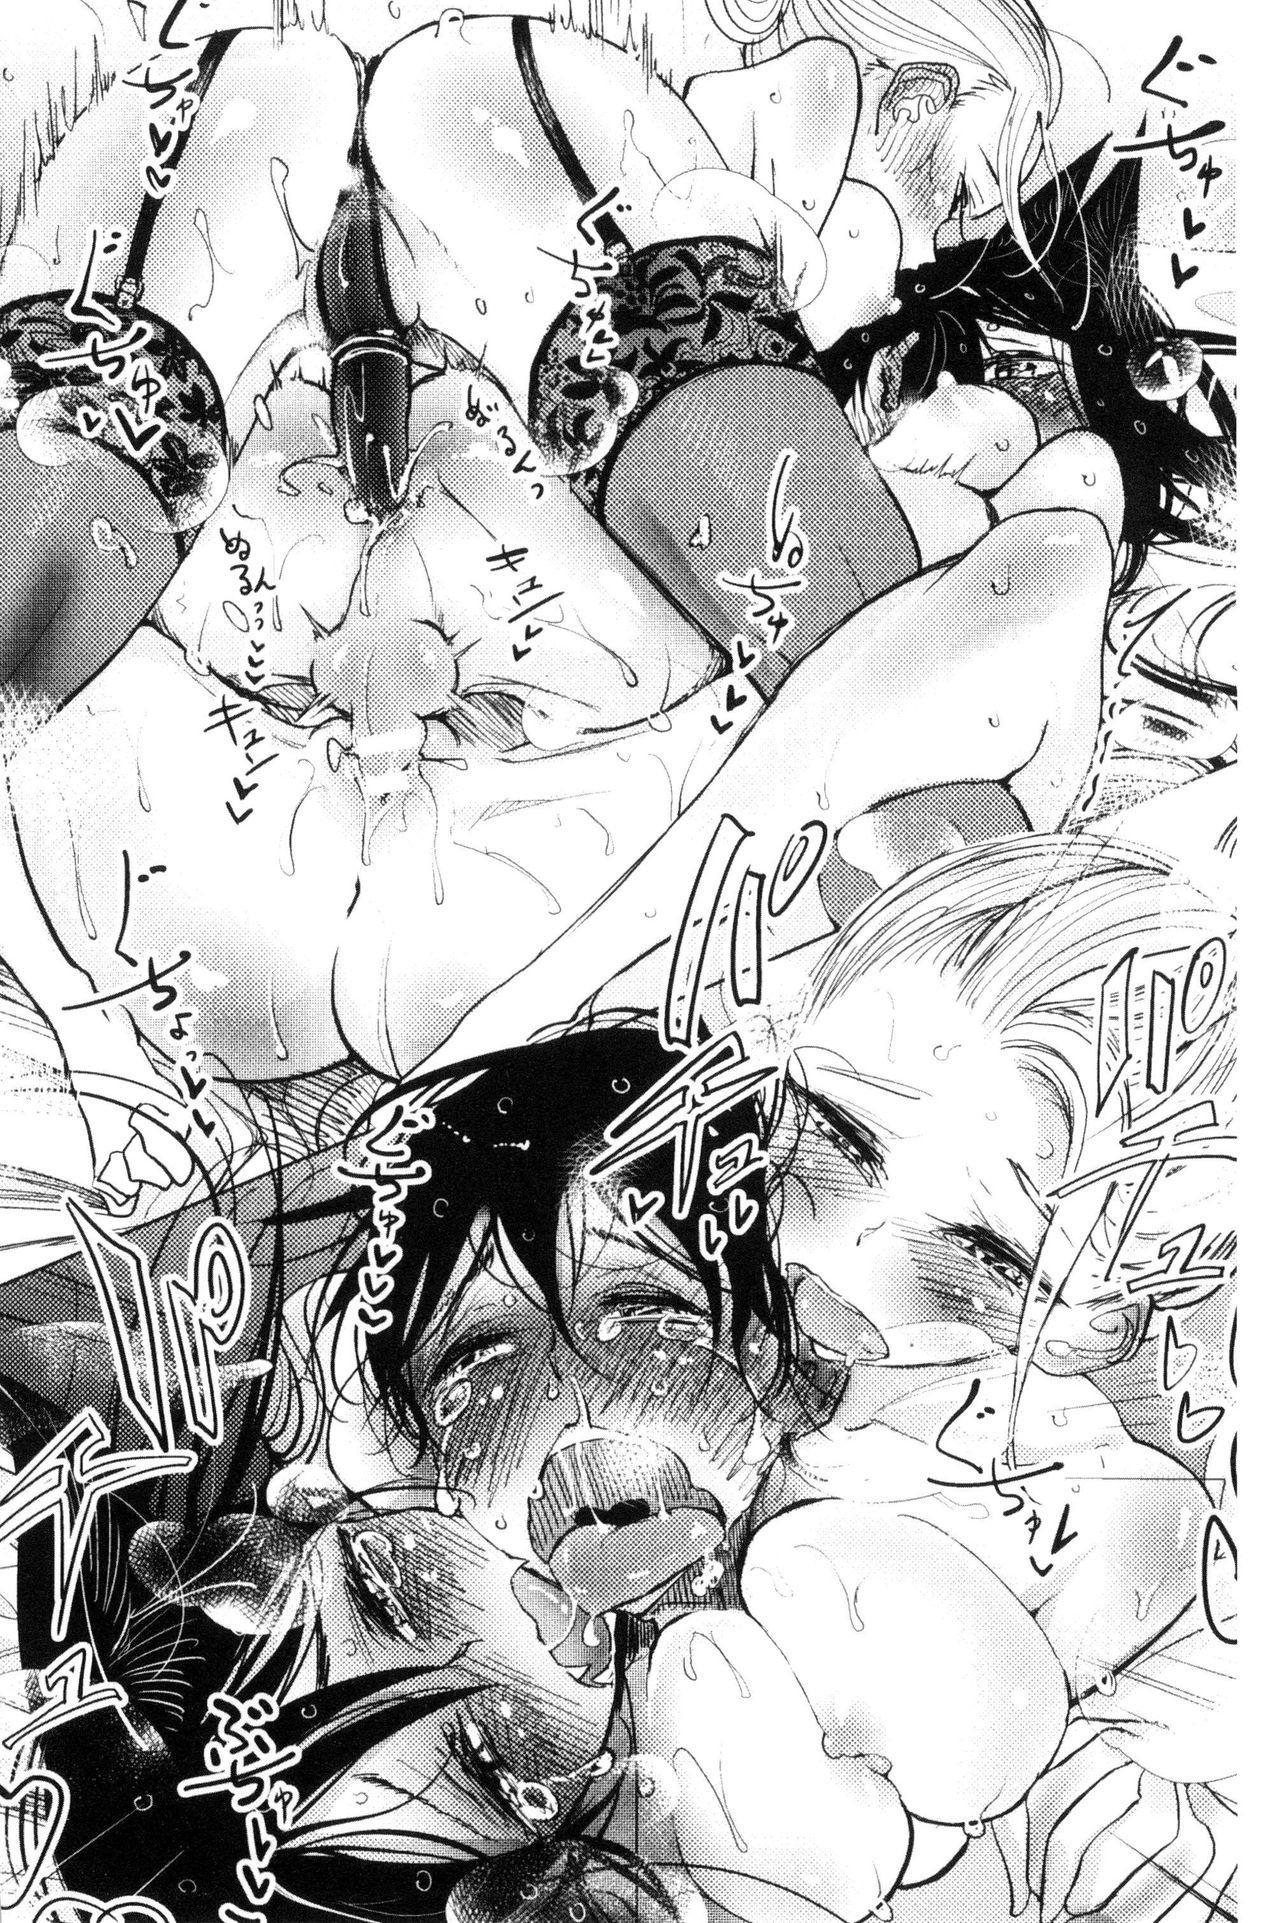 [Dhibi] Sono Yubisaki de Korogashite - Please Caress it at the Finger-tip. [Chinese] 59